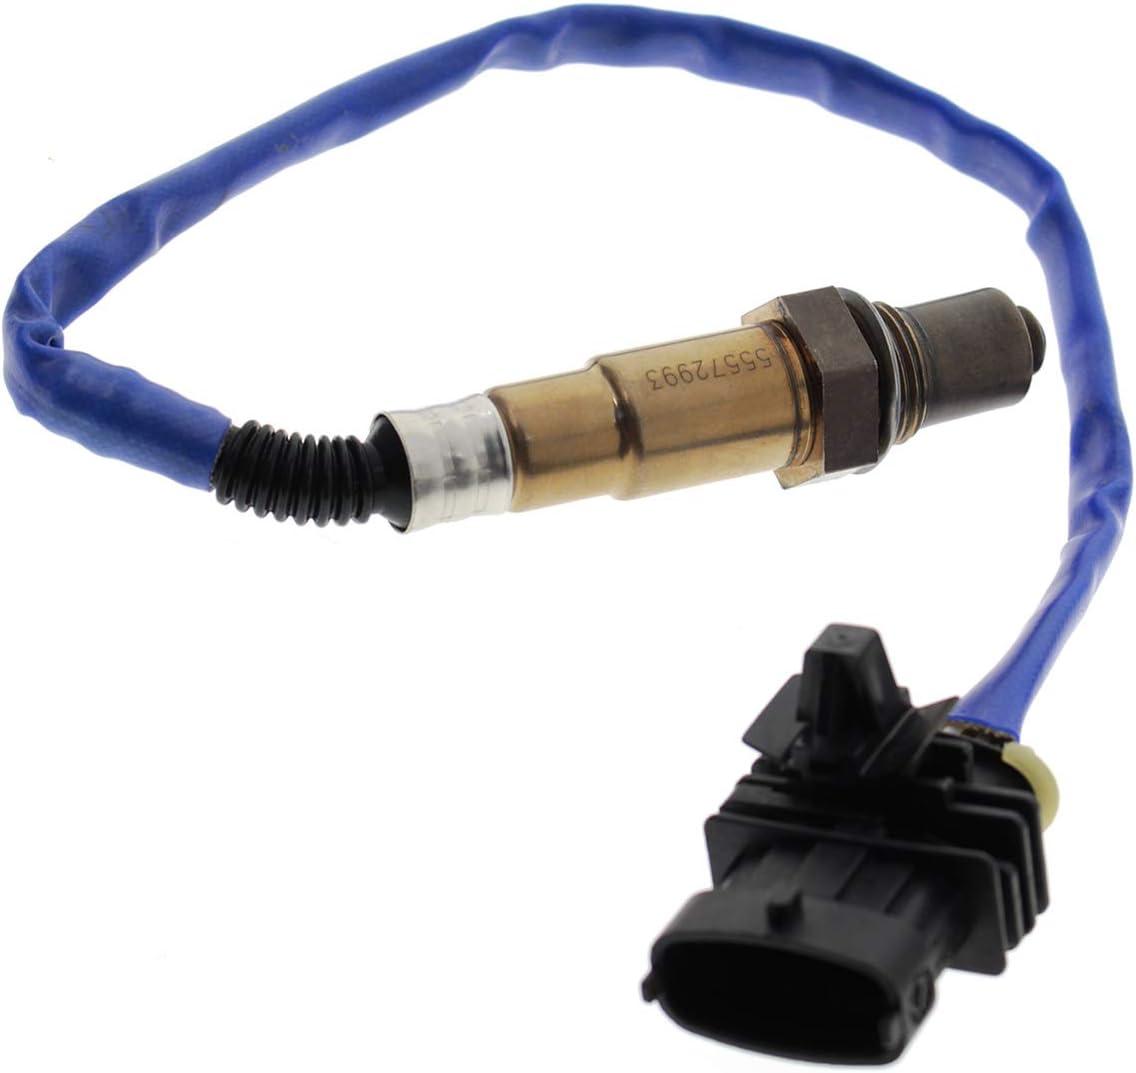 MOTOALL 55572993 213-4764 Upstream O2 Oxygen Sensor for 2011-2015 Cruze Sonic Trax Encore 1.4L